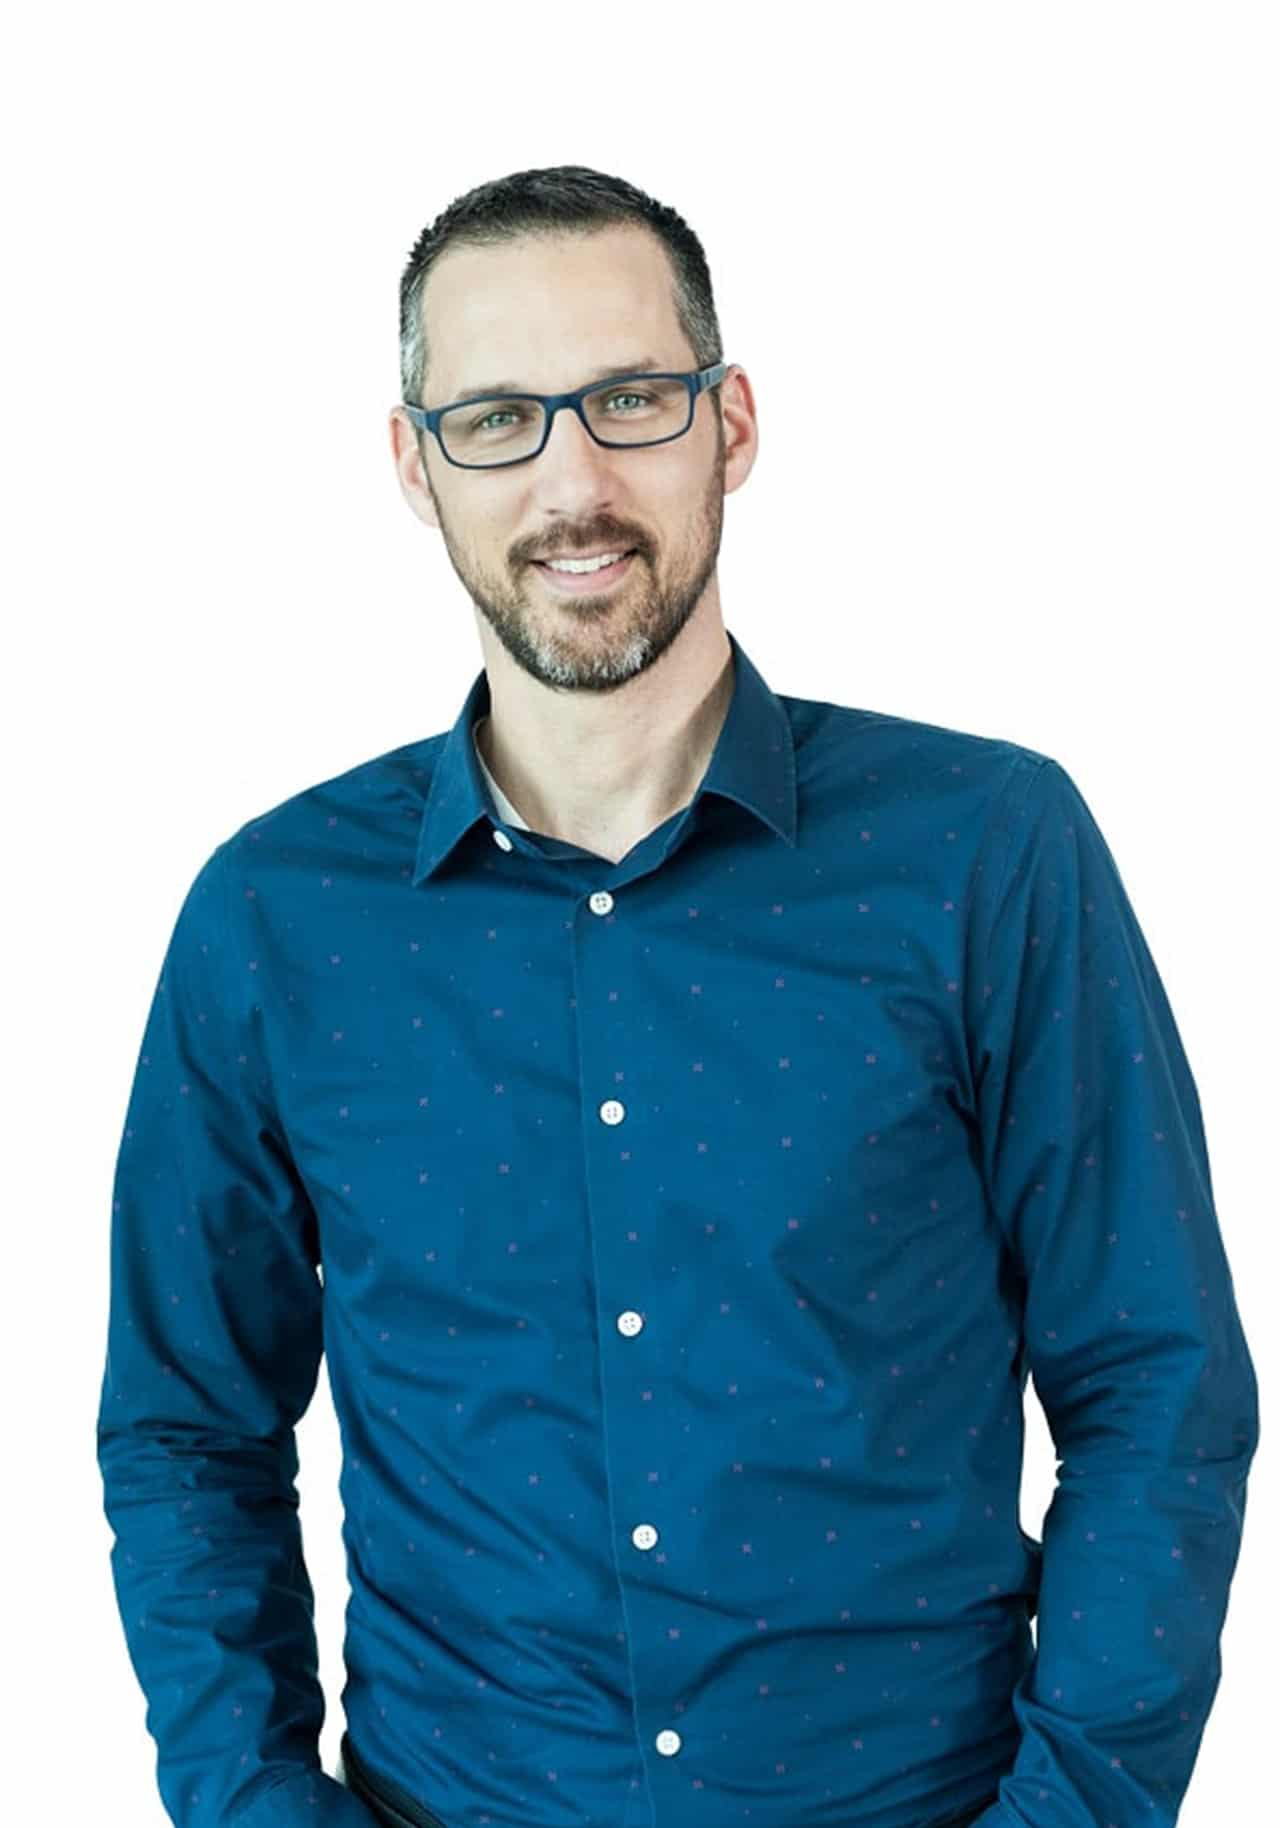 Greg Van Popta